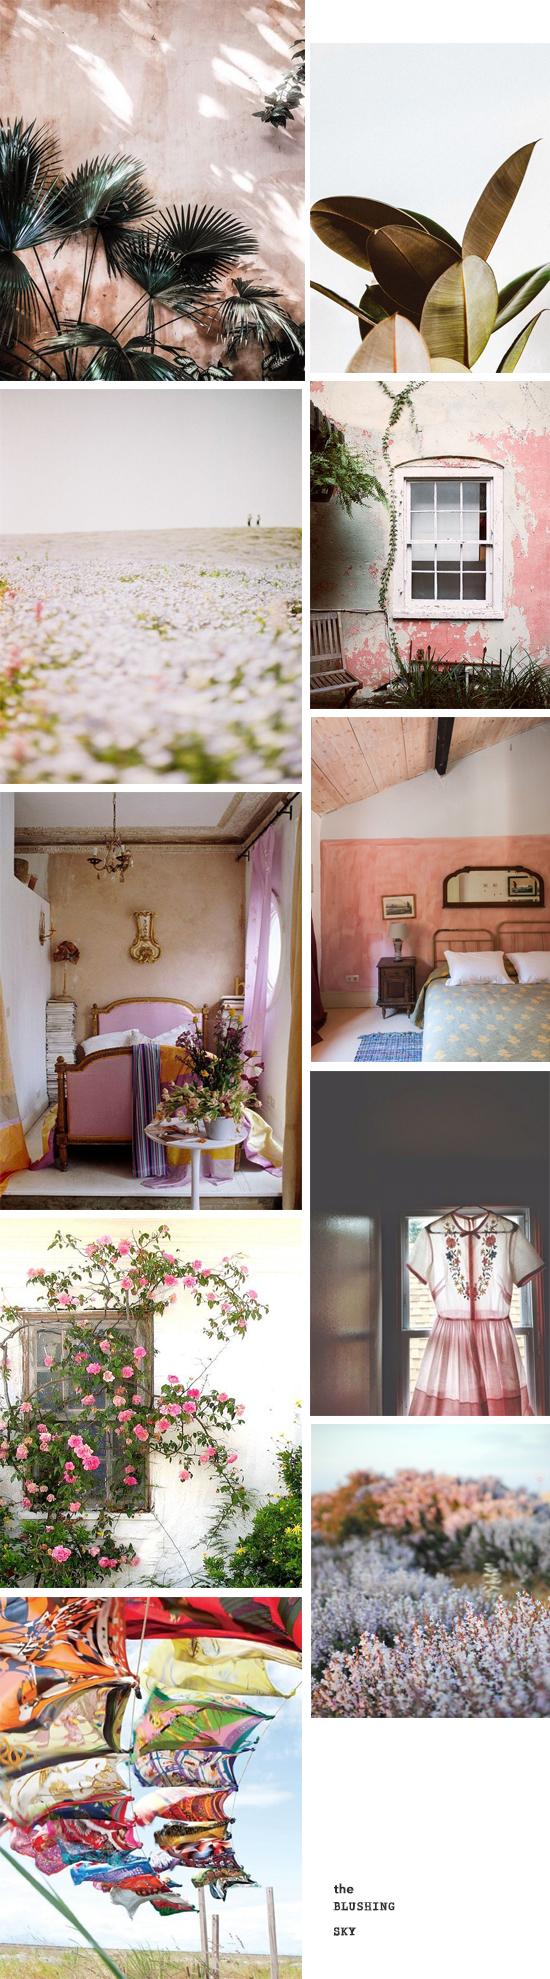 Thegardenershouse-blushpinkdecor00a